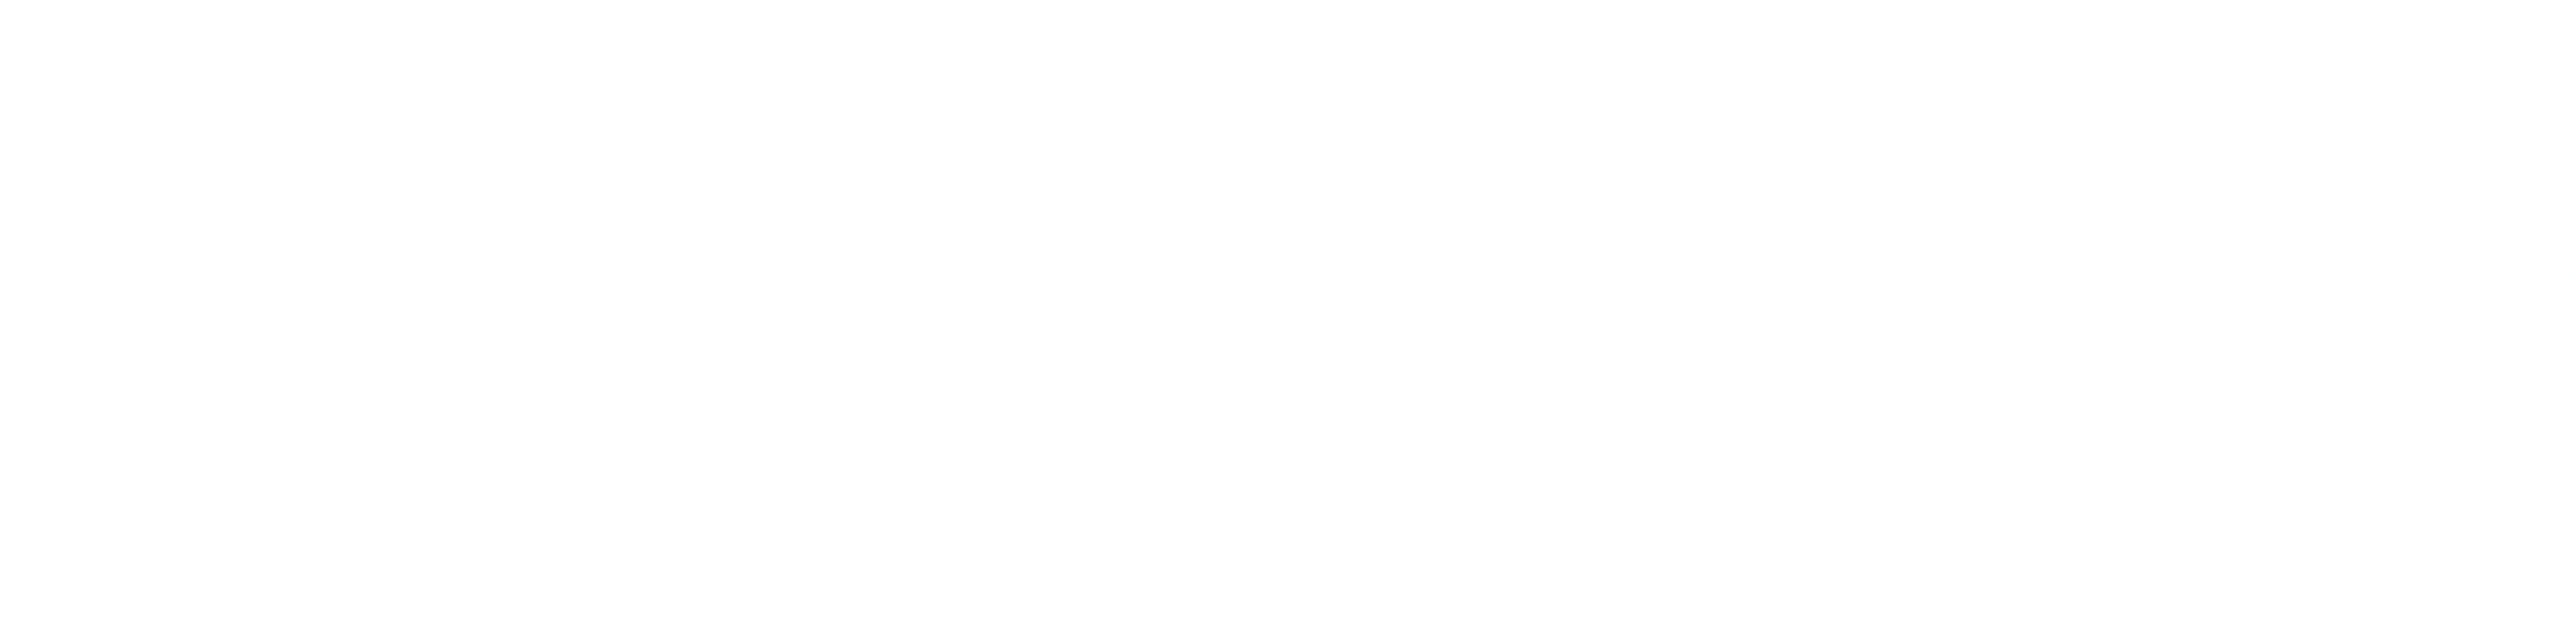 fw-horizontal-white.png